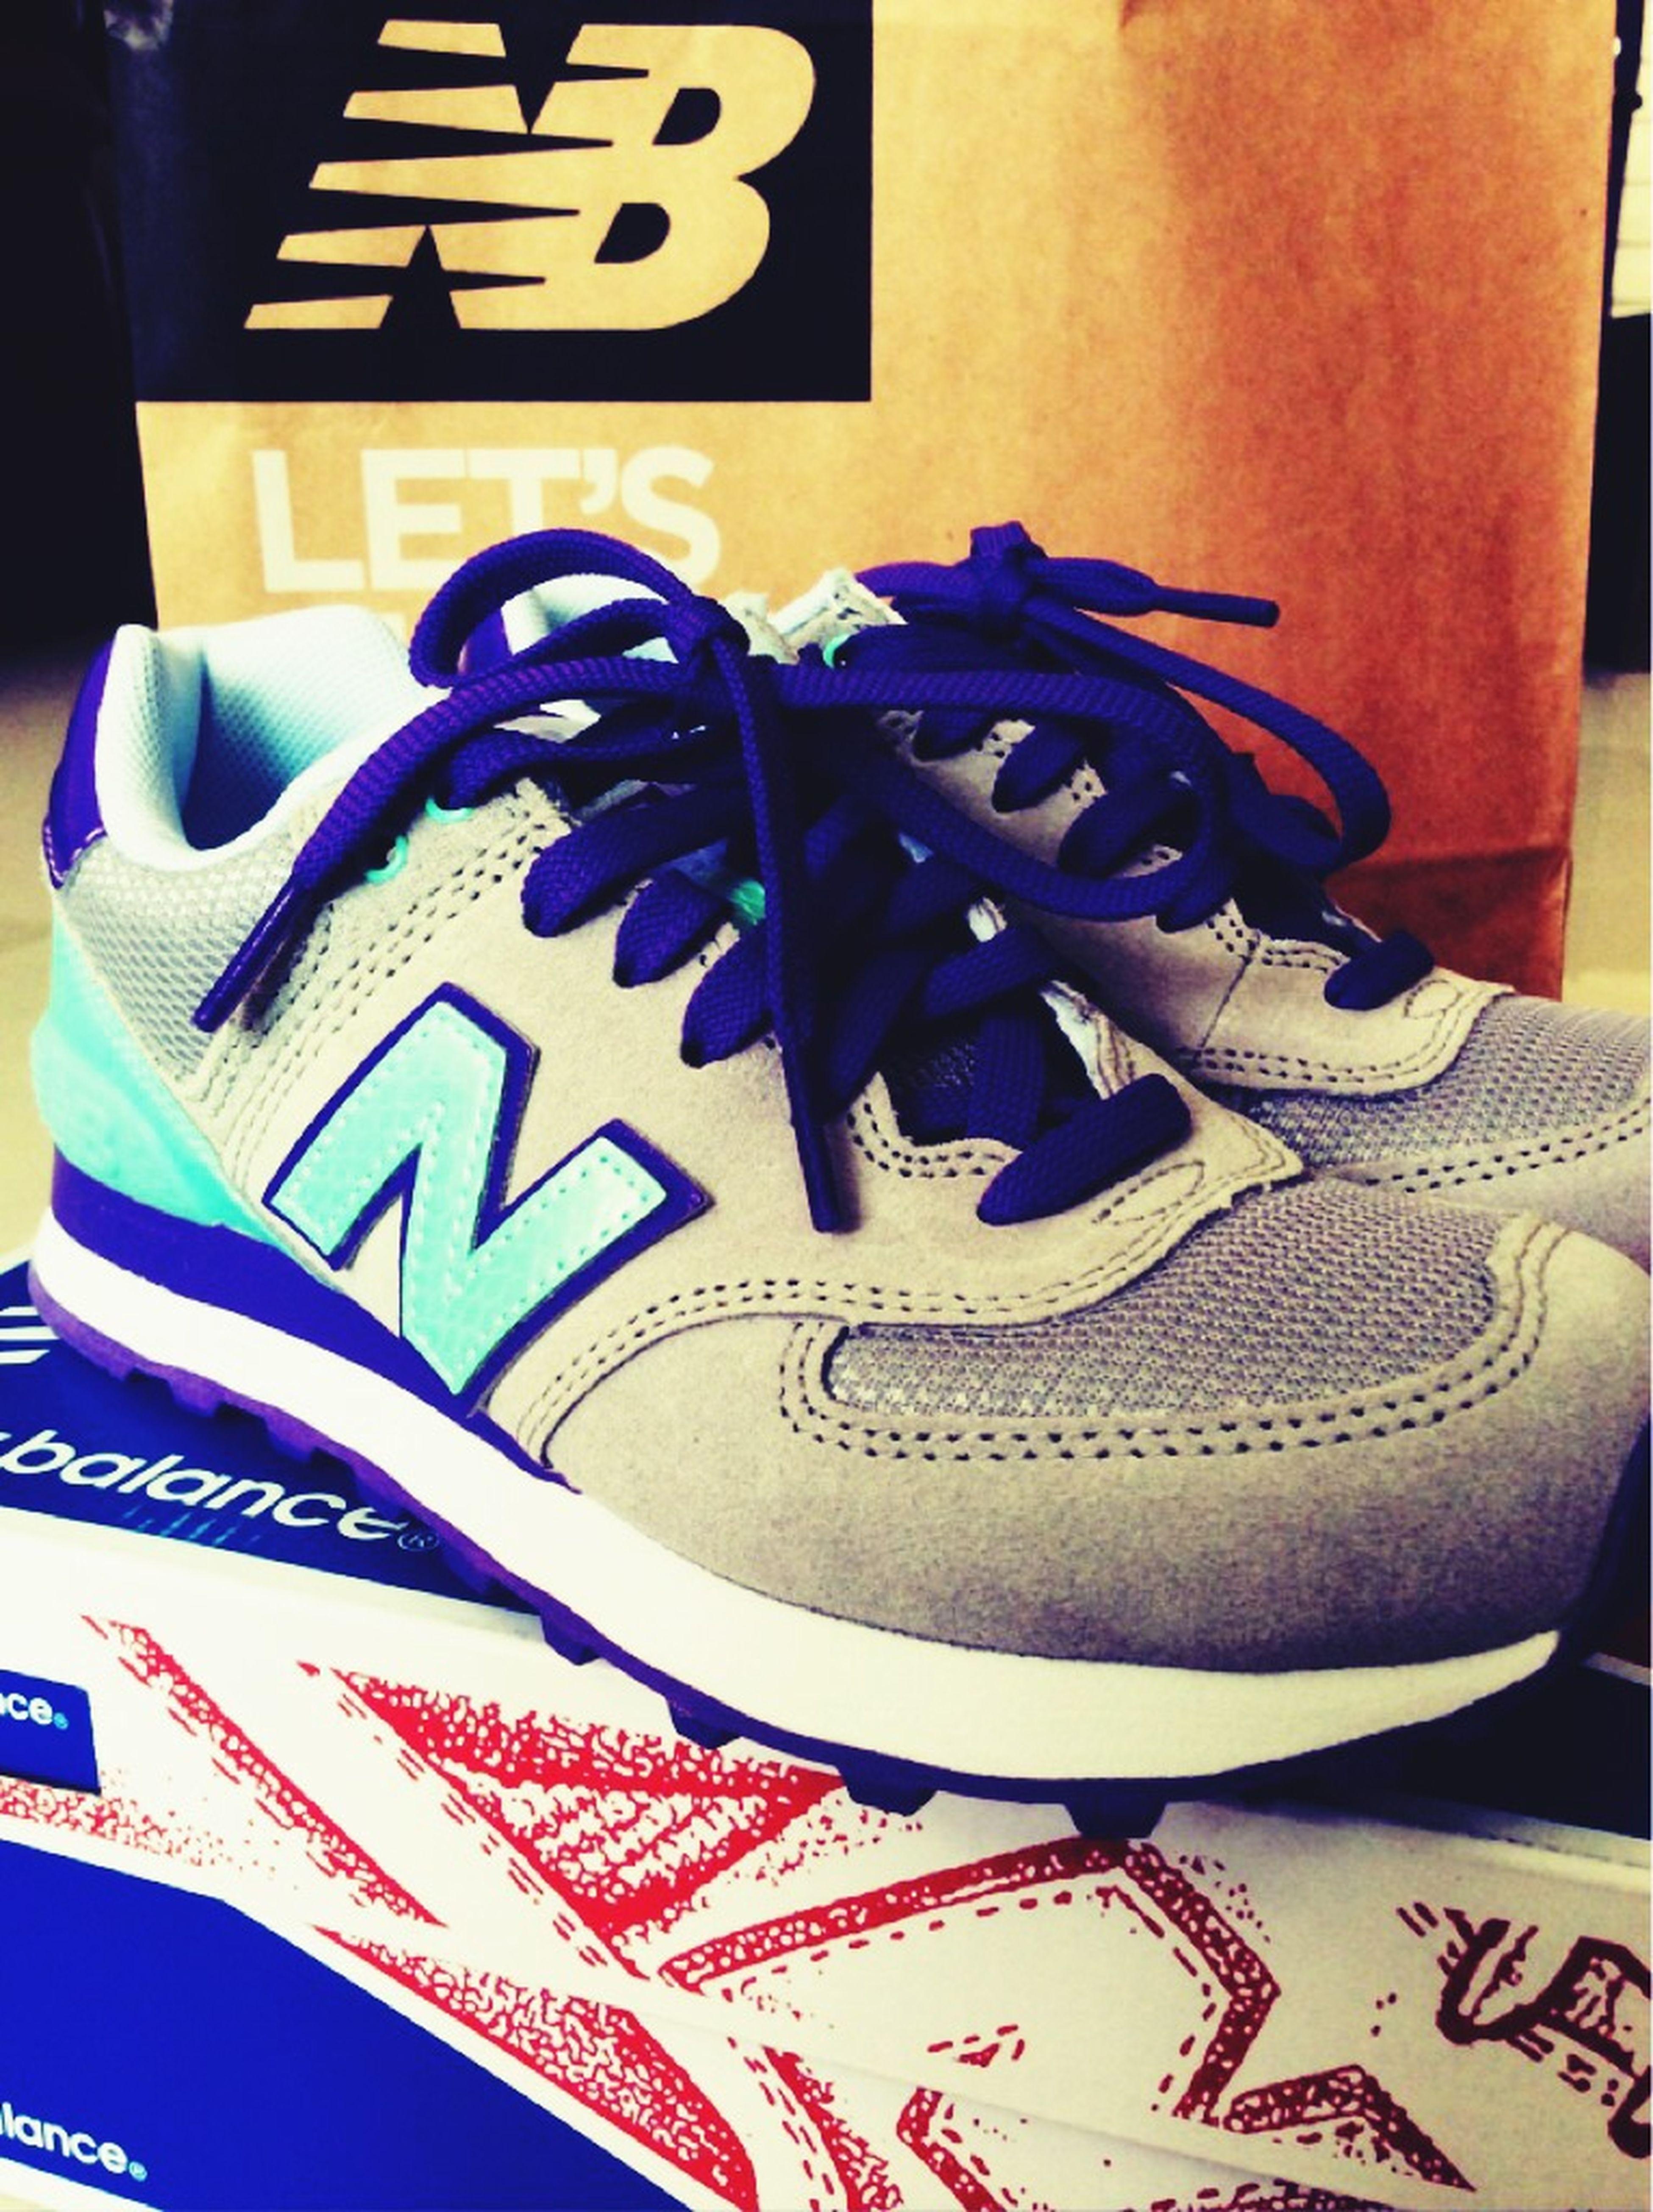 NewBalance Newbalance574 Newbalance574 Sneakers